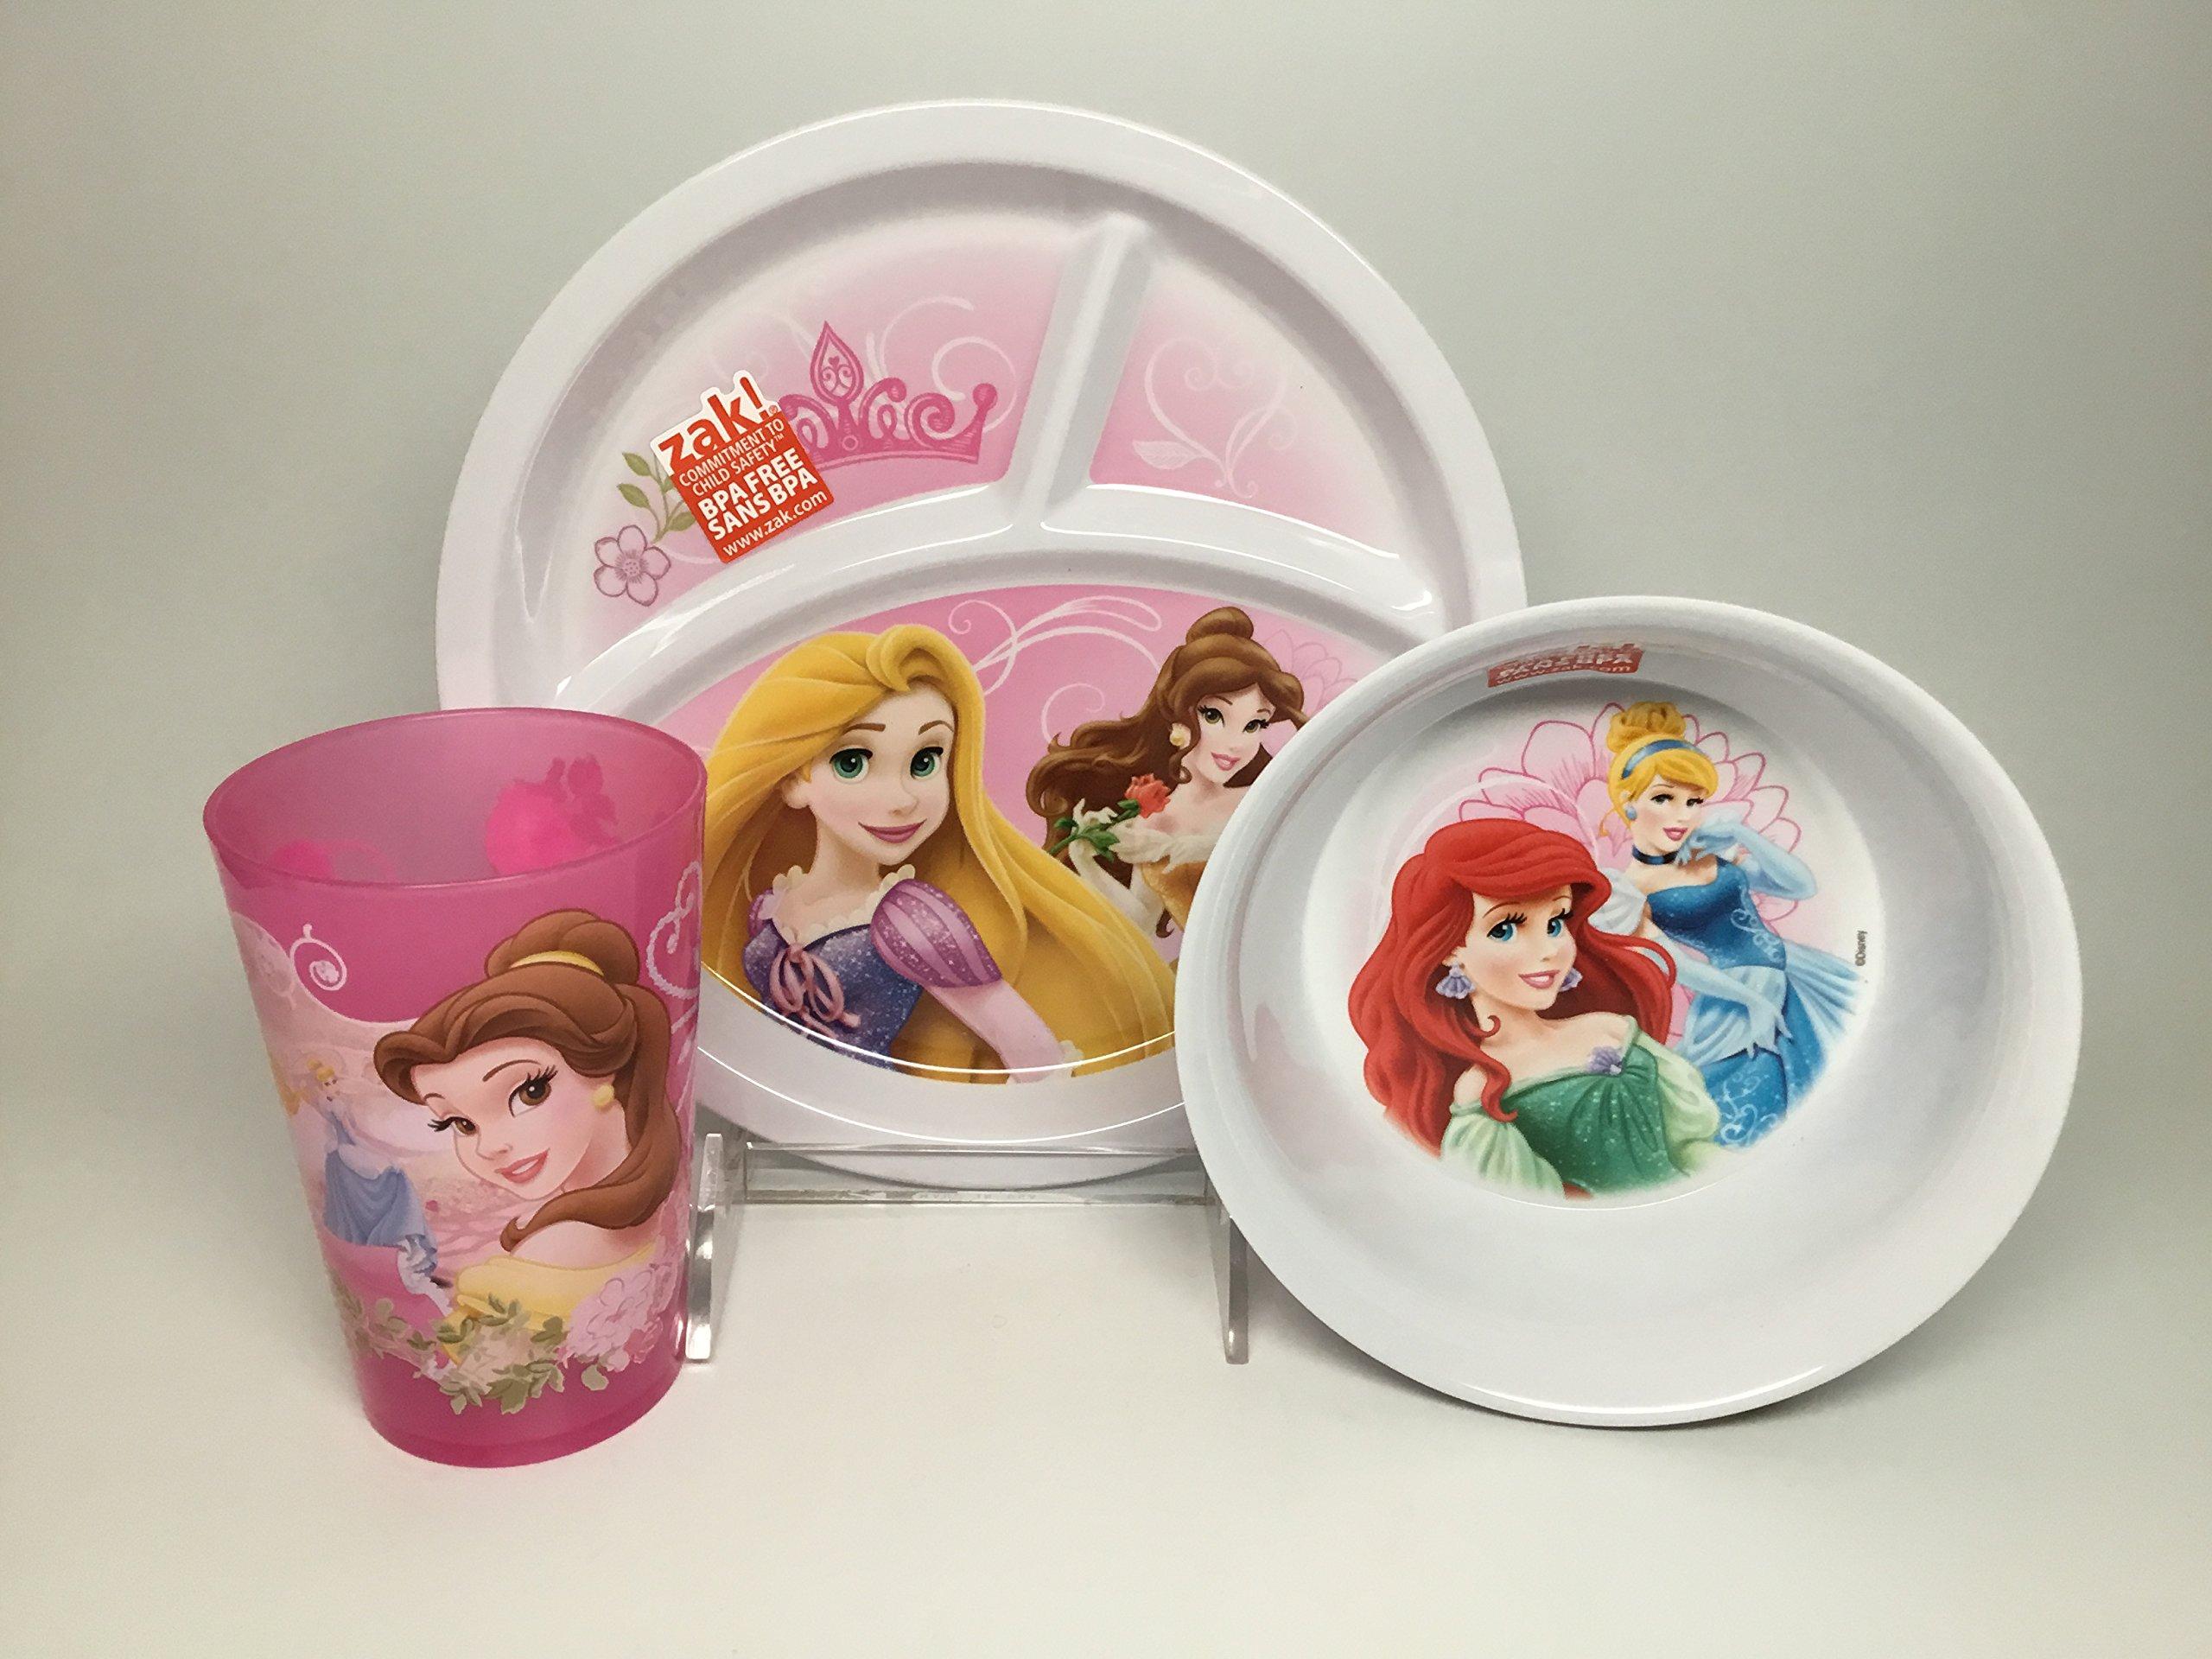 Disney Princess Divided Plate Set